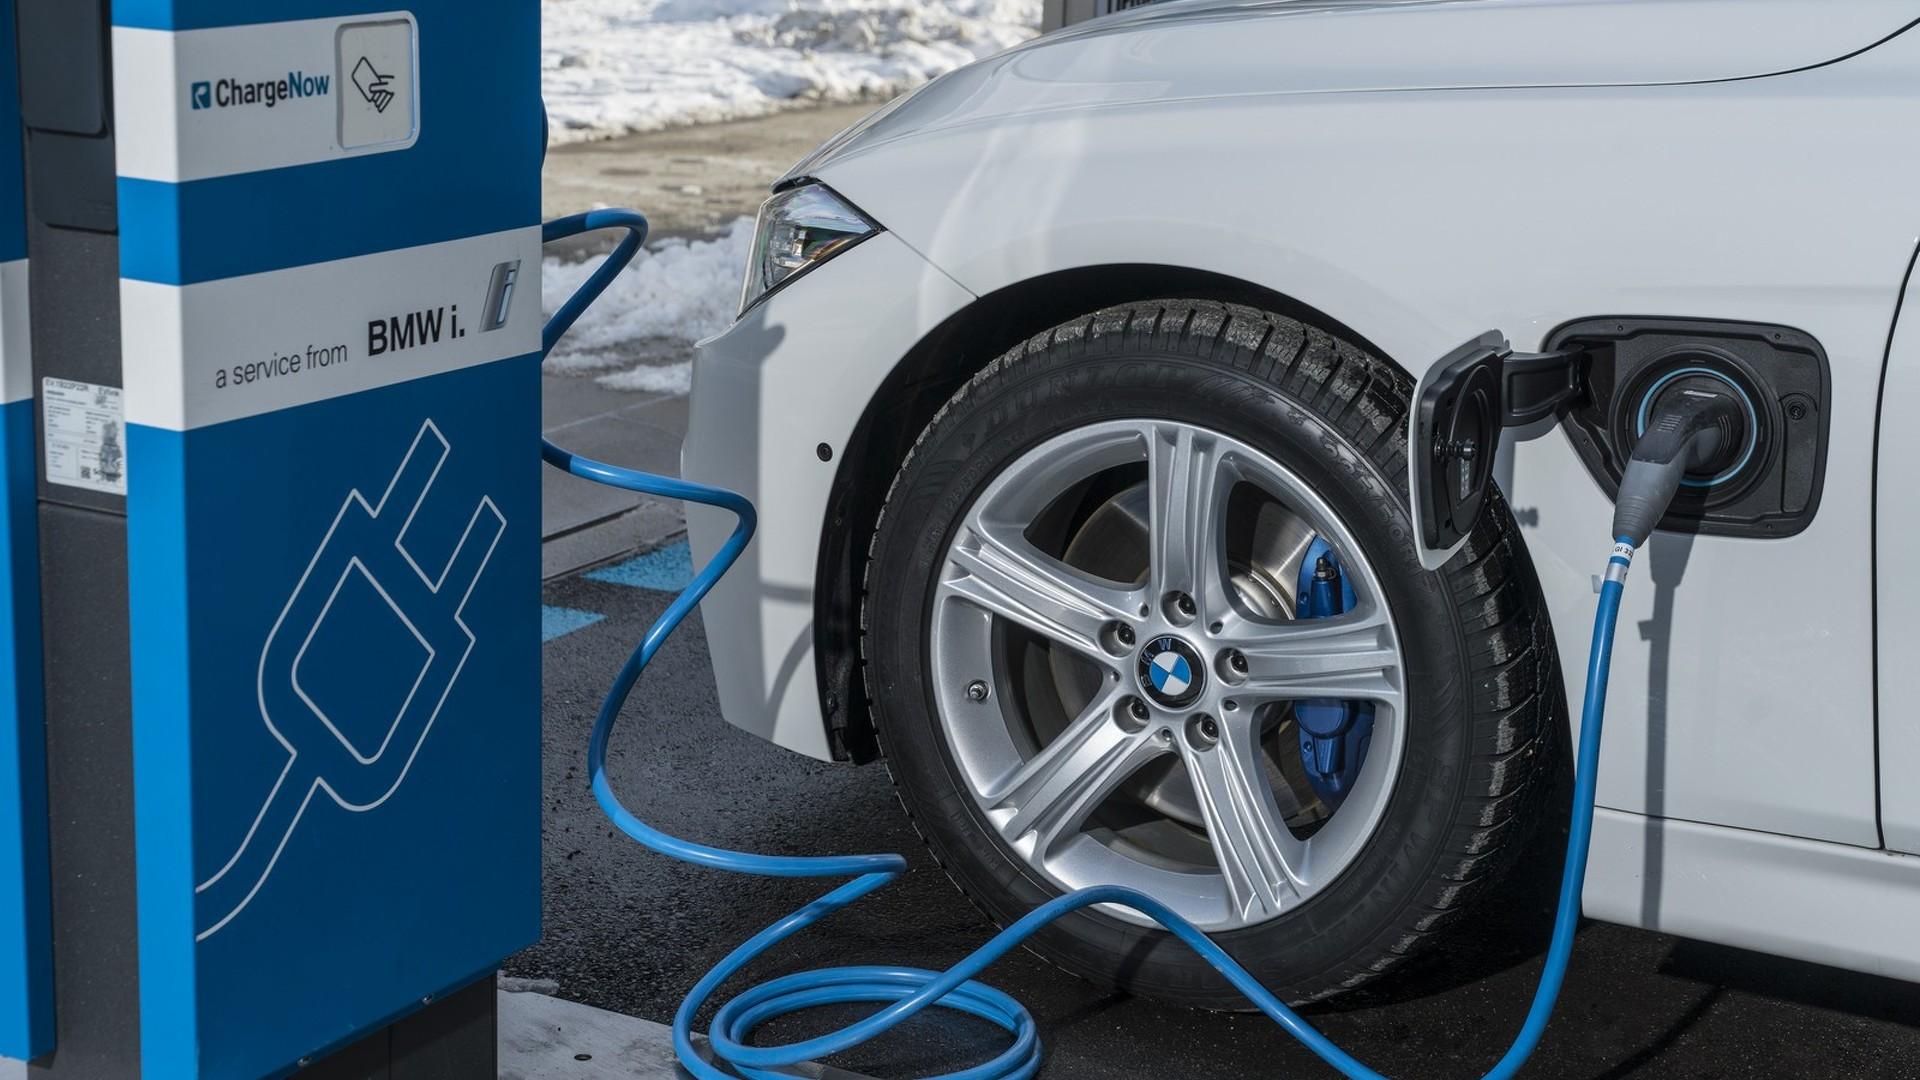 Photo of Πως βλέπει την ηλεκτροκίνηση η BMW;